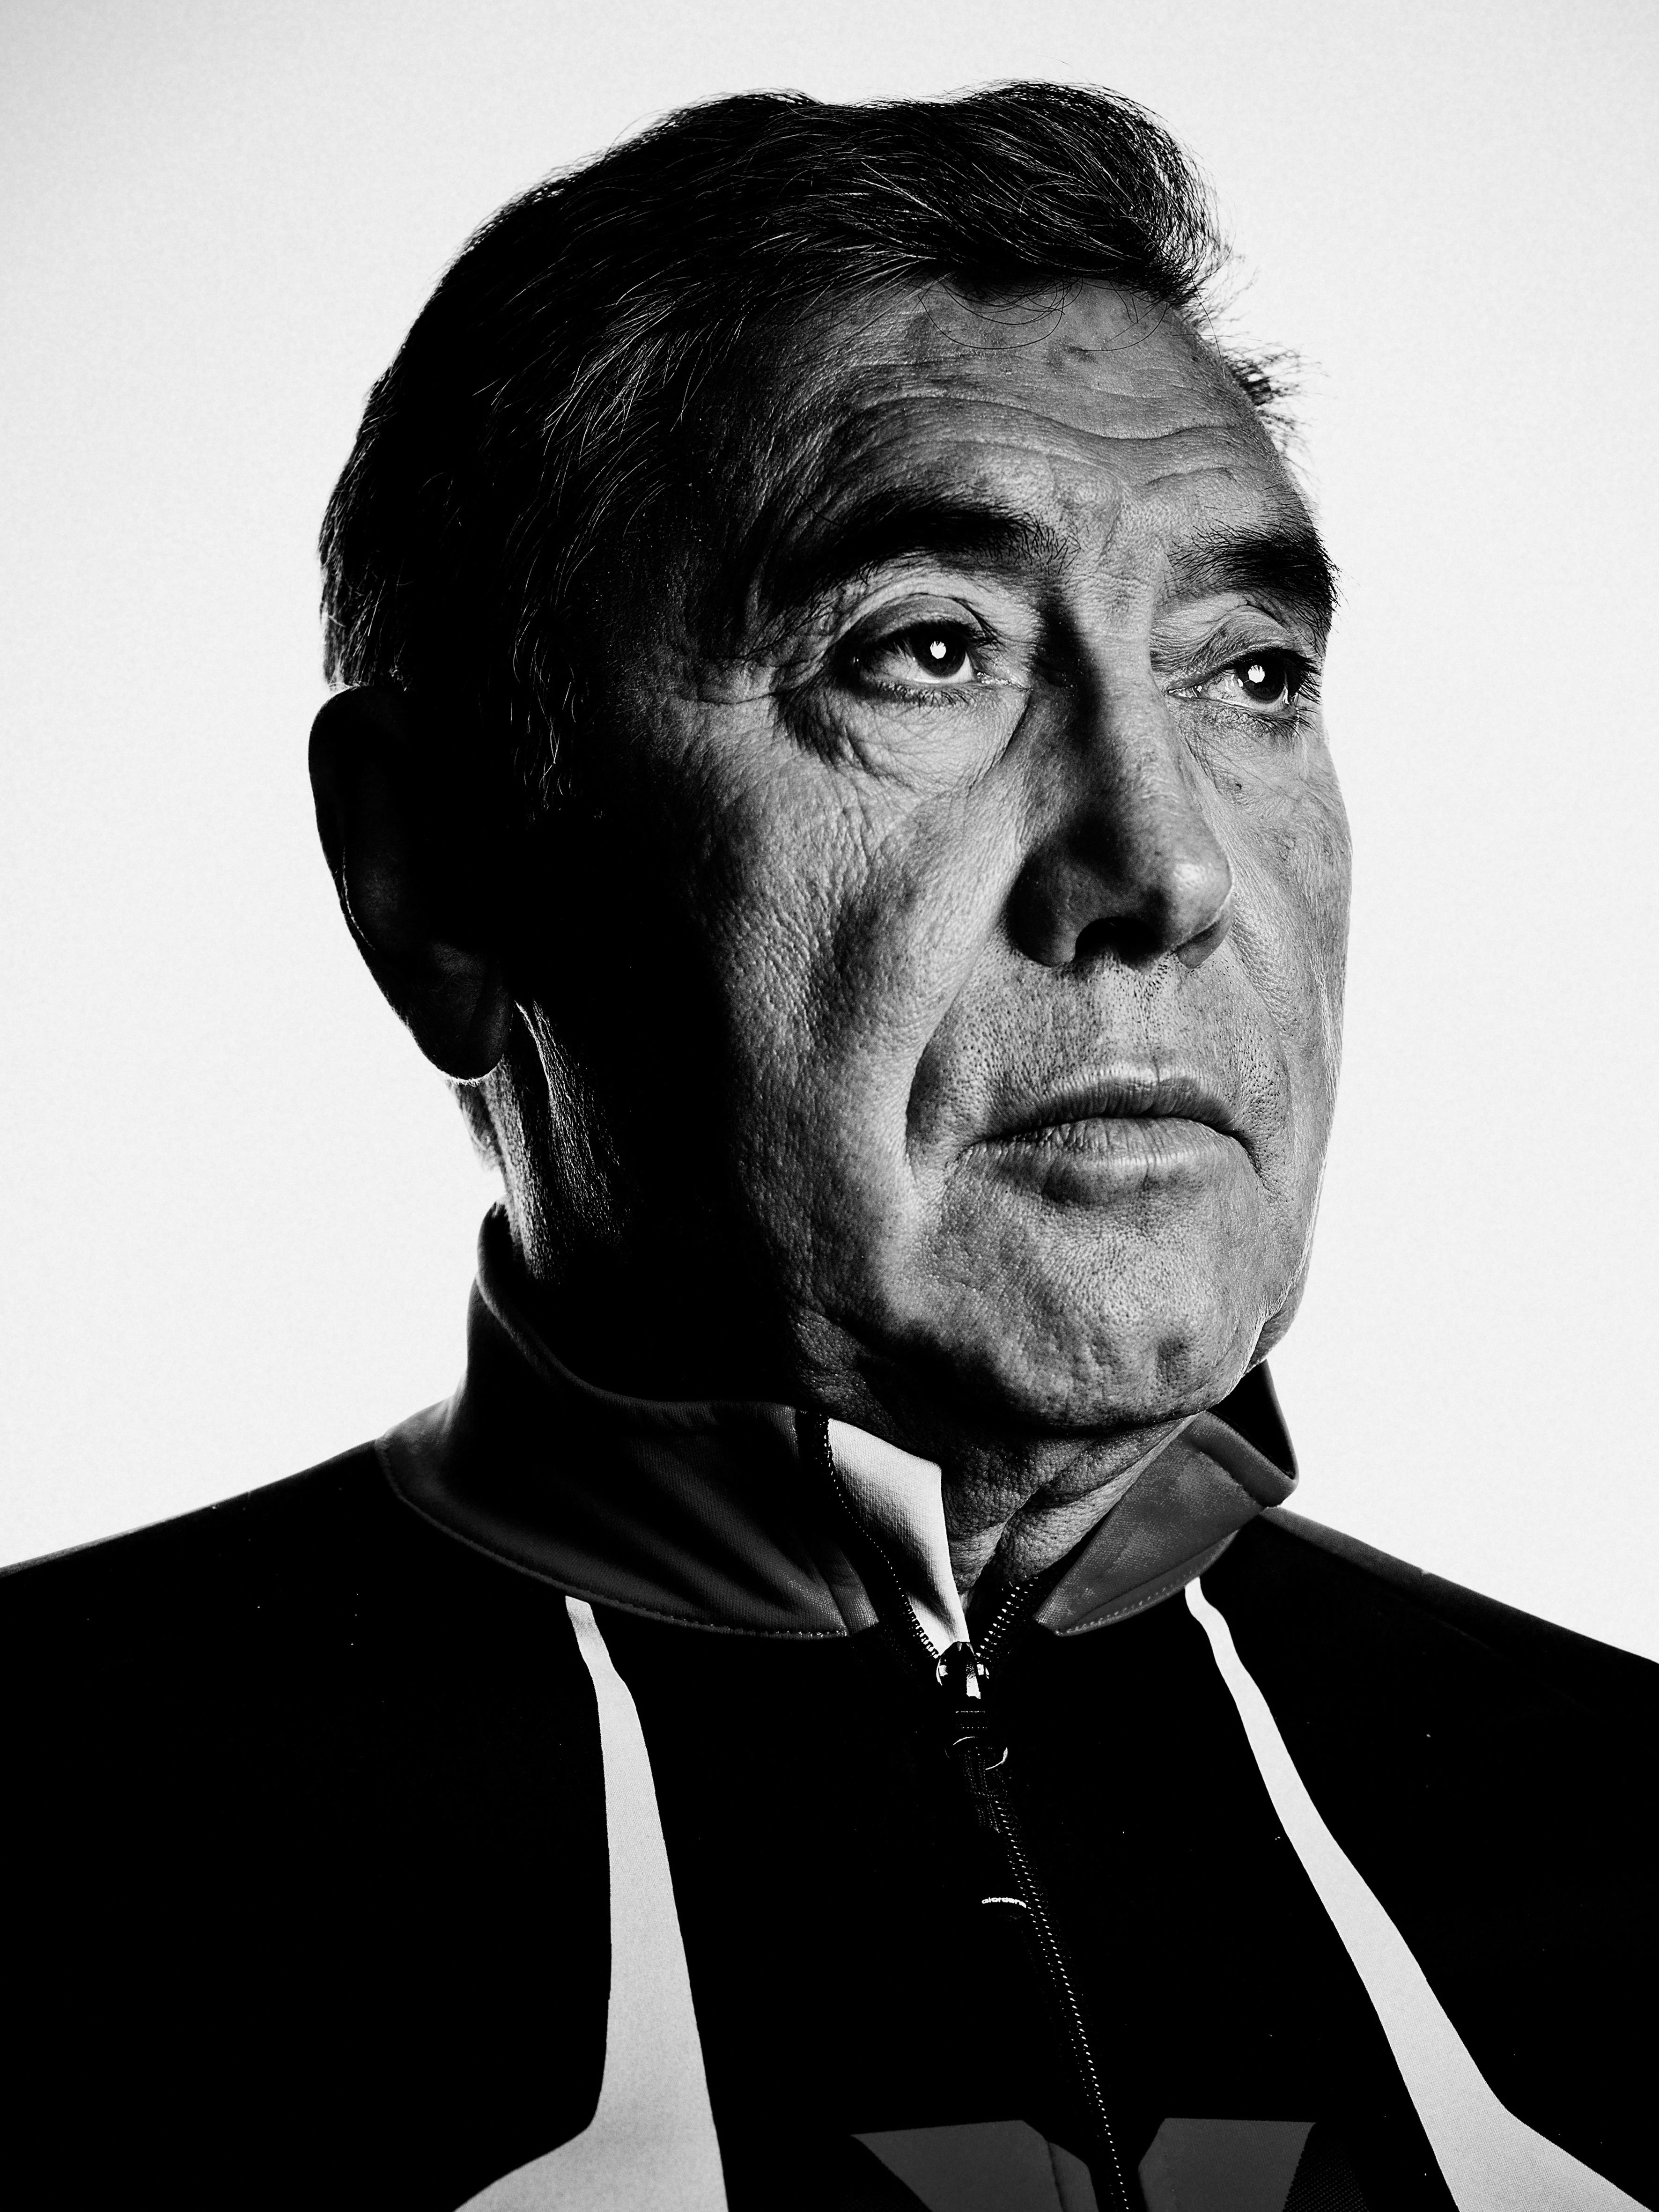 Eddy Merckx 0060Zw